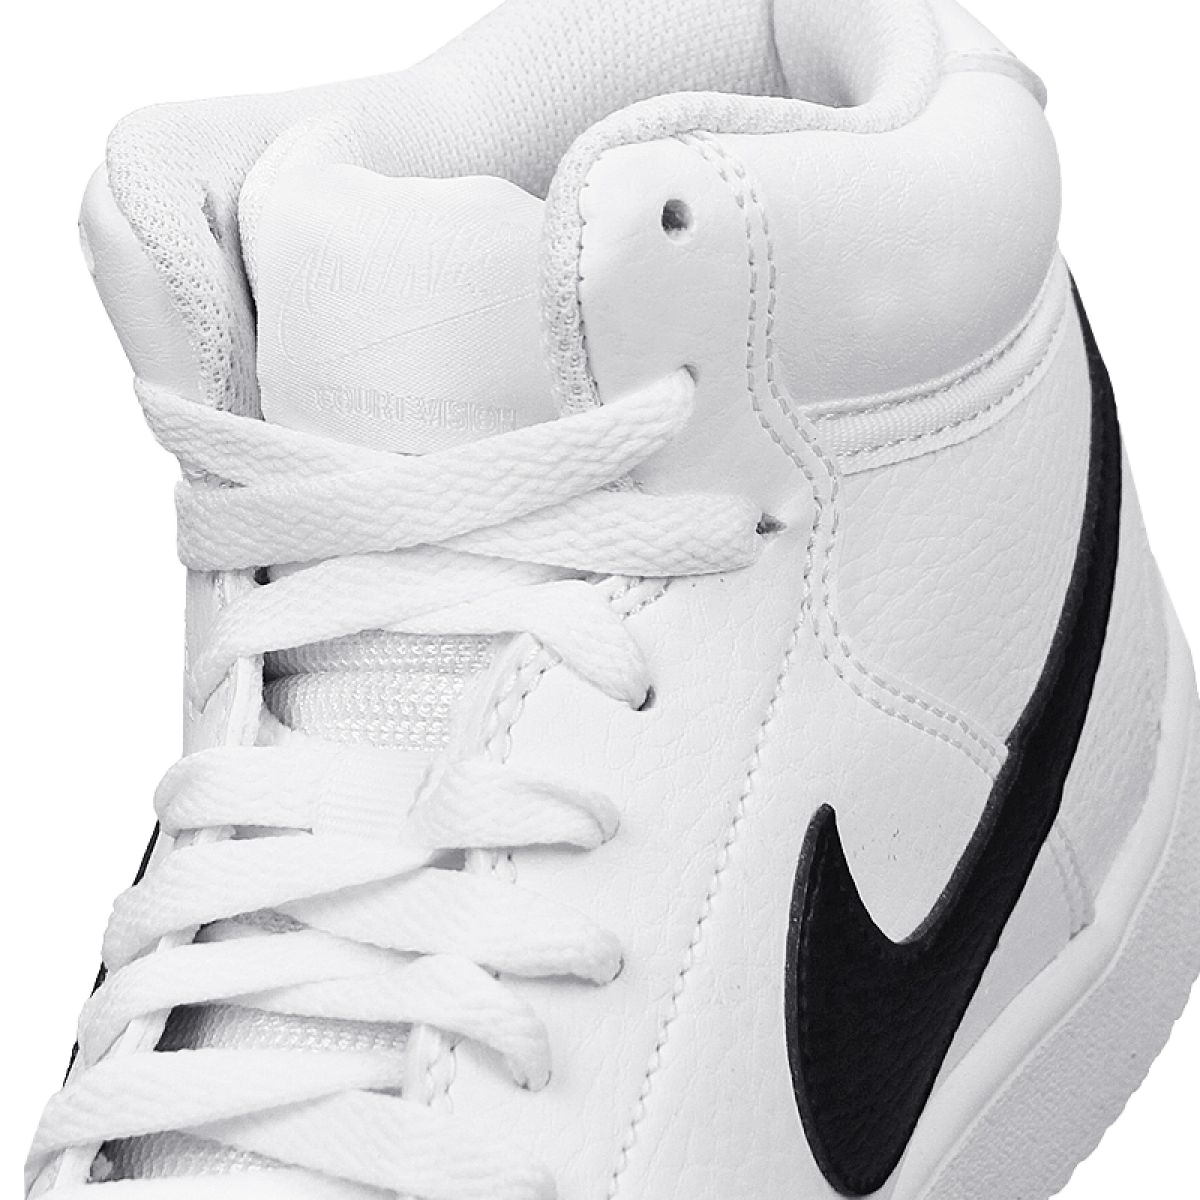 Sapatilhas Nike Court Vision Mid M CD5466 101 branco